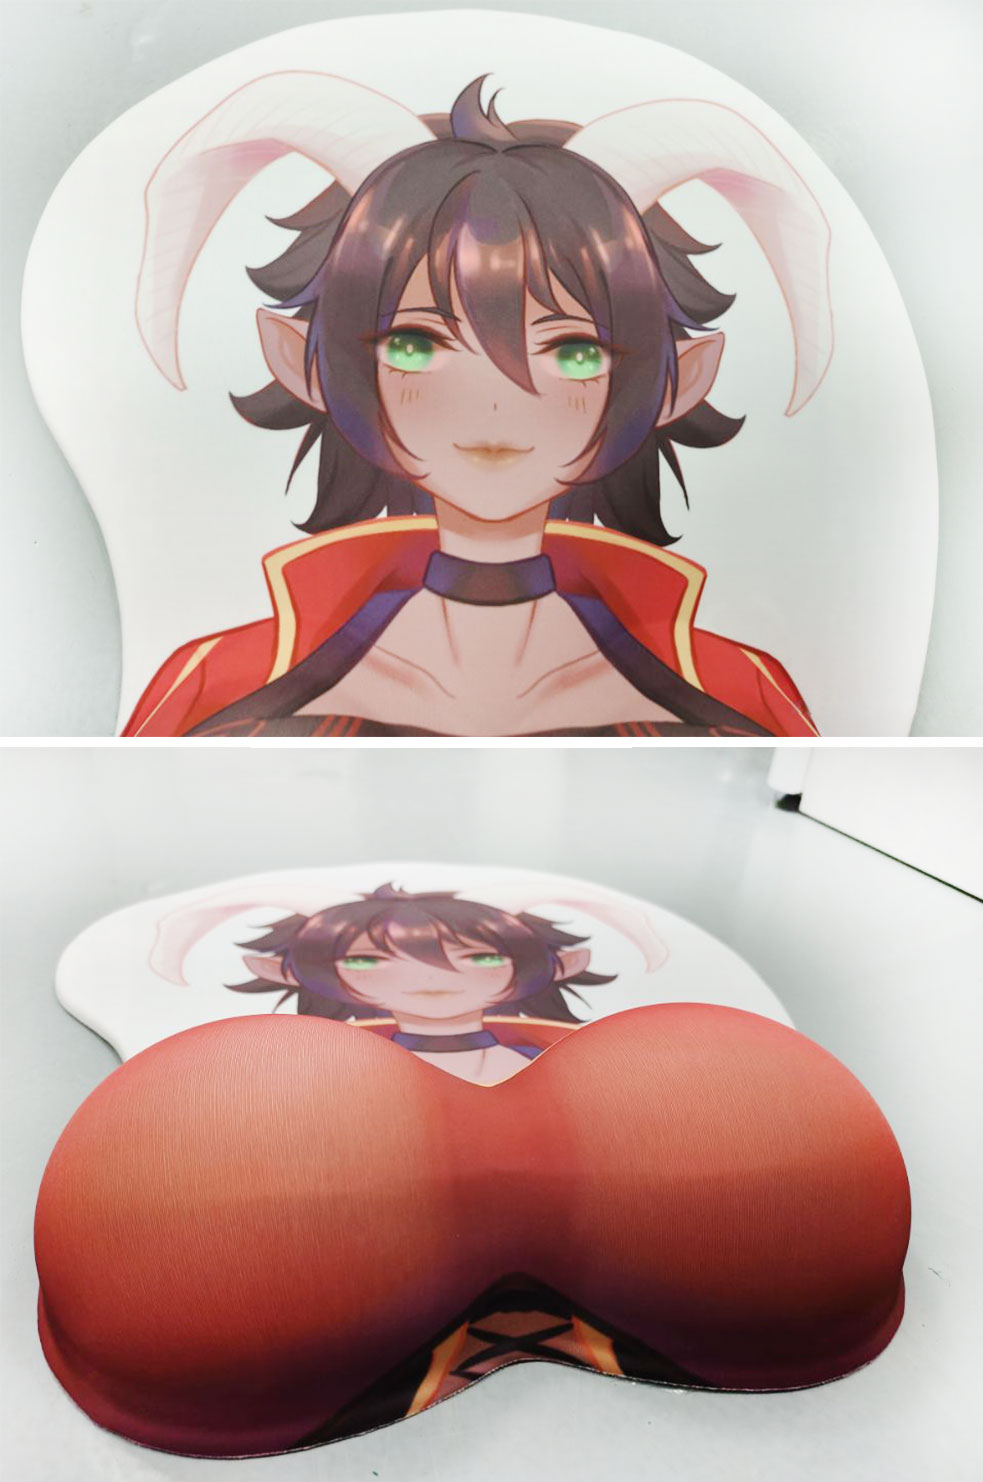 joan of arc life size oppai mousepad ver1 7320 - Anime Mousepads